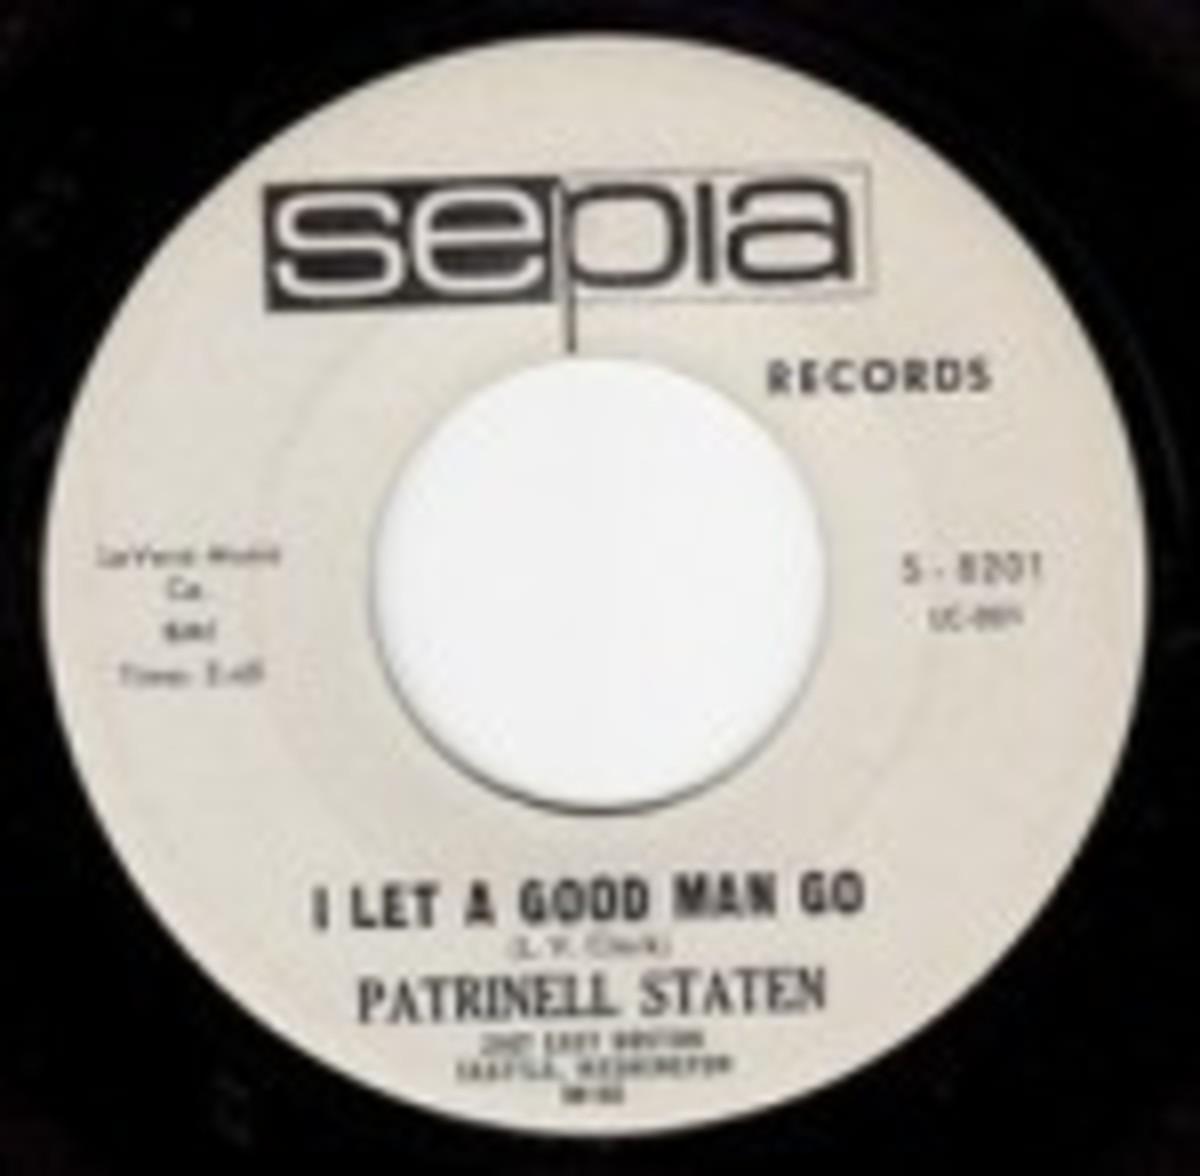 Patrinell State, Litle Love Affair I Let A Good Man Go